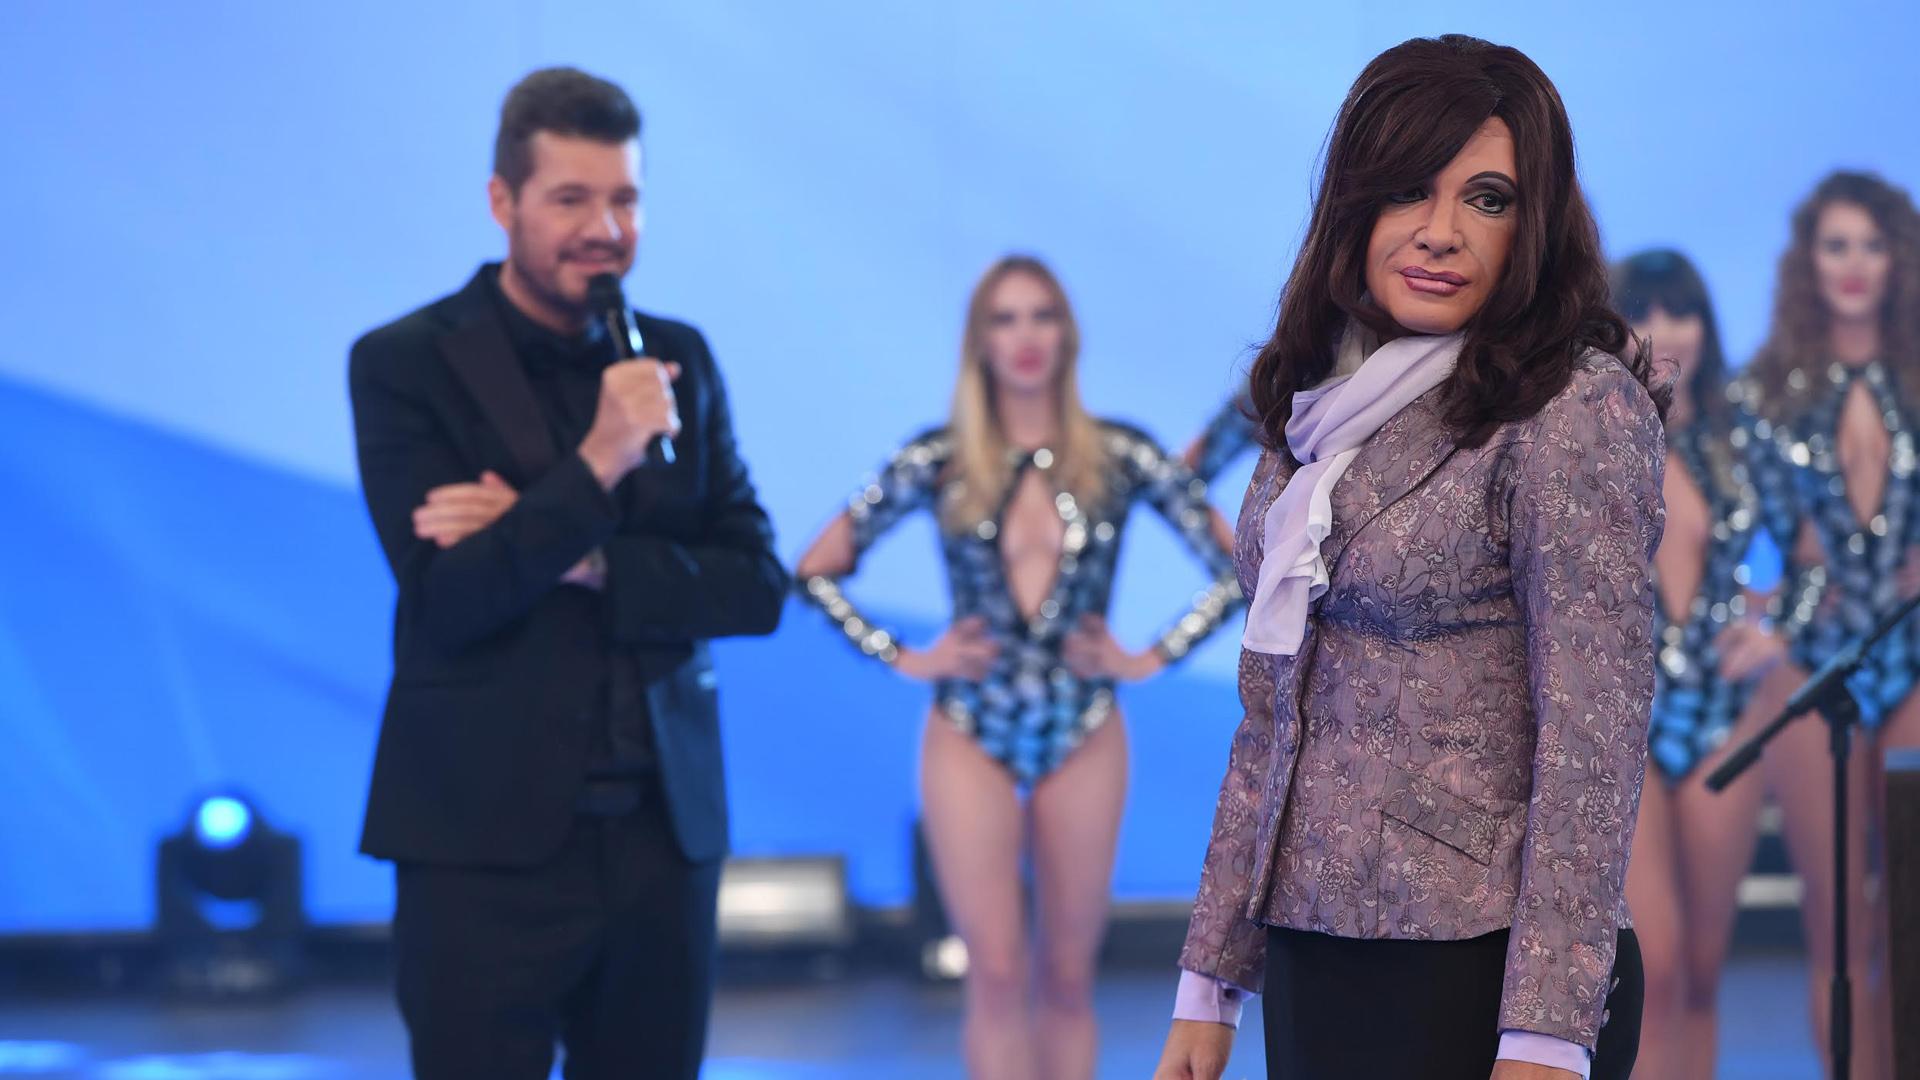 Martín Bossi imitando a Cristina Fernández de Kirchner